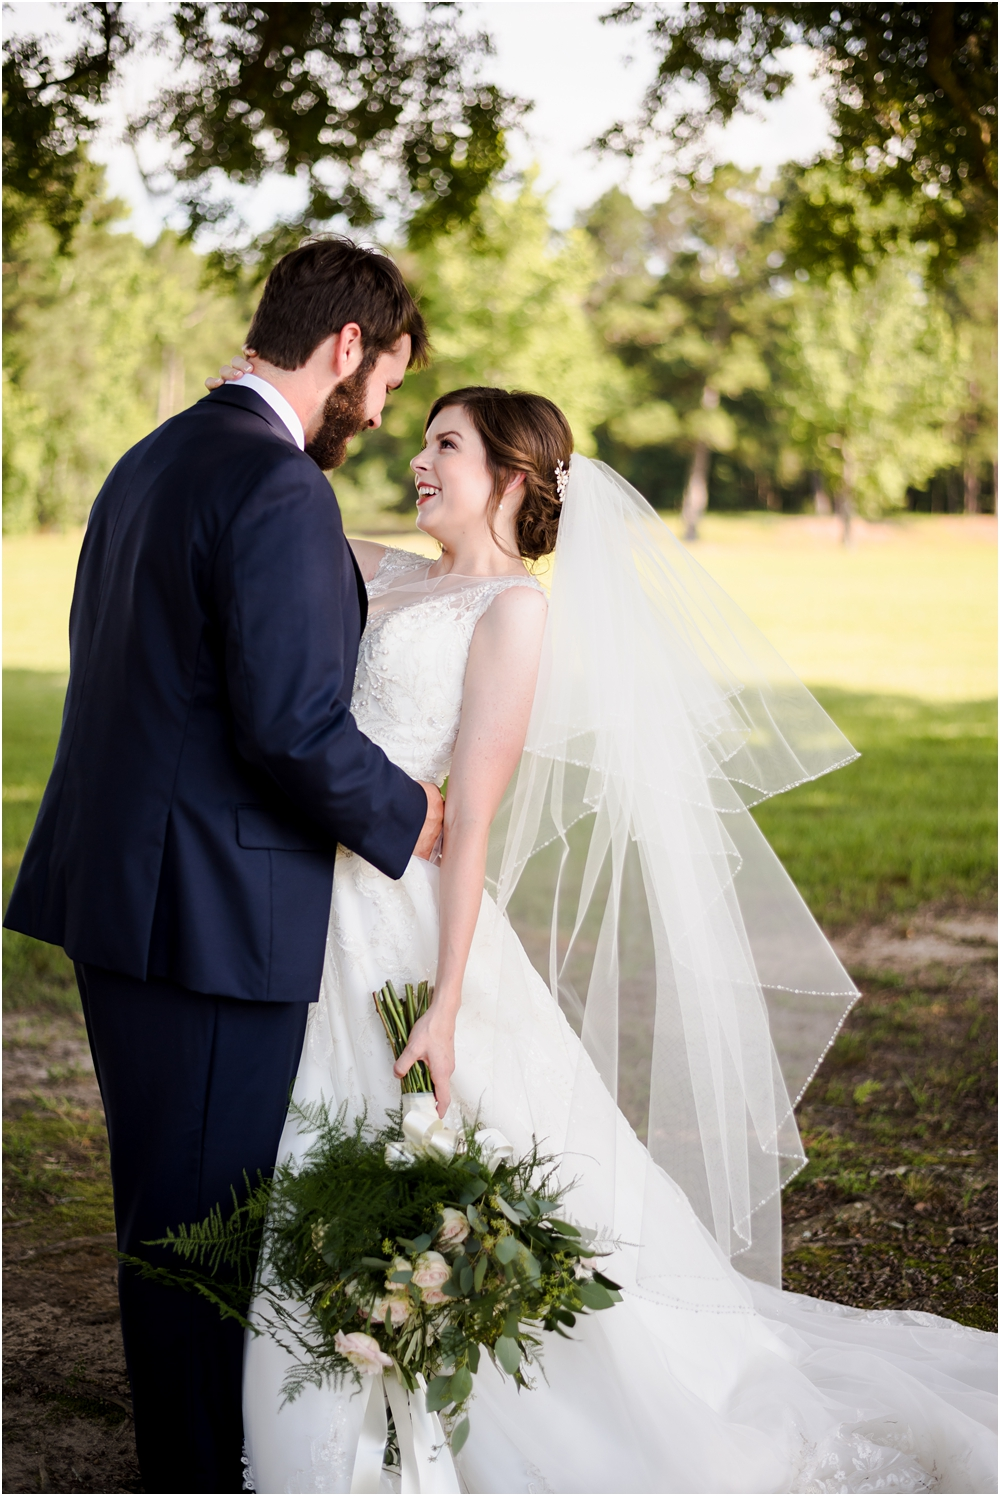 marianna-florida-wedding-photographer-kiersten-grant-64.jpg